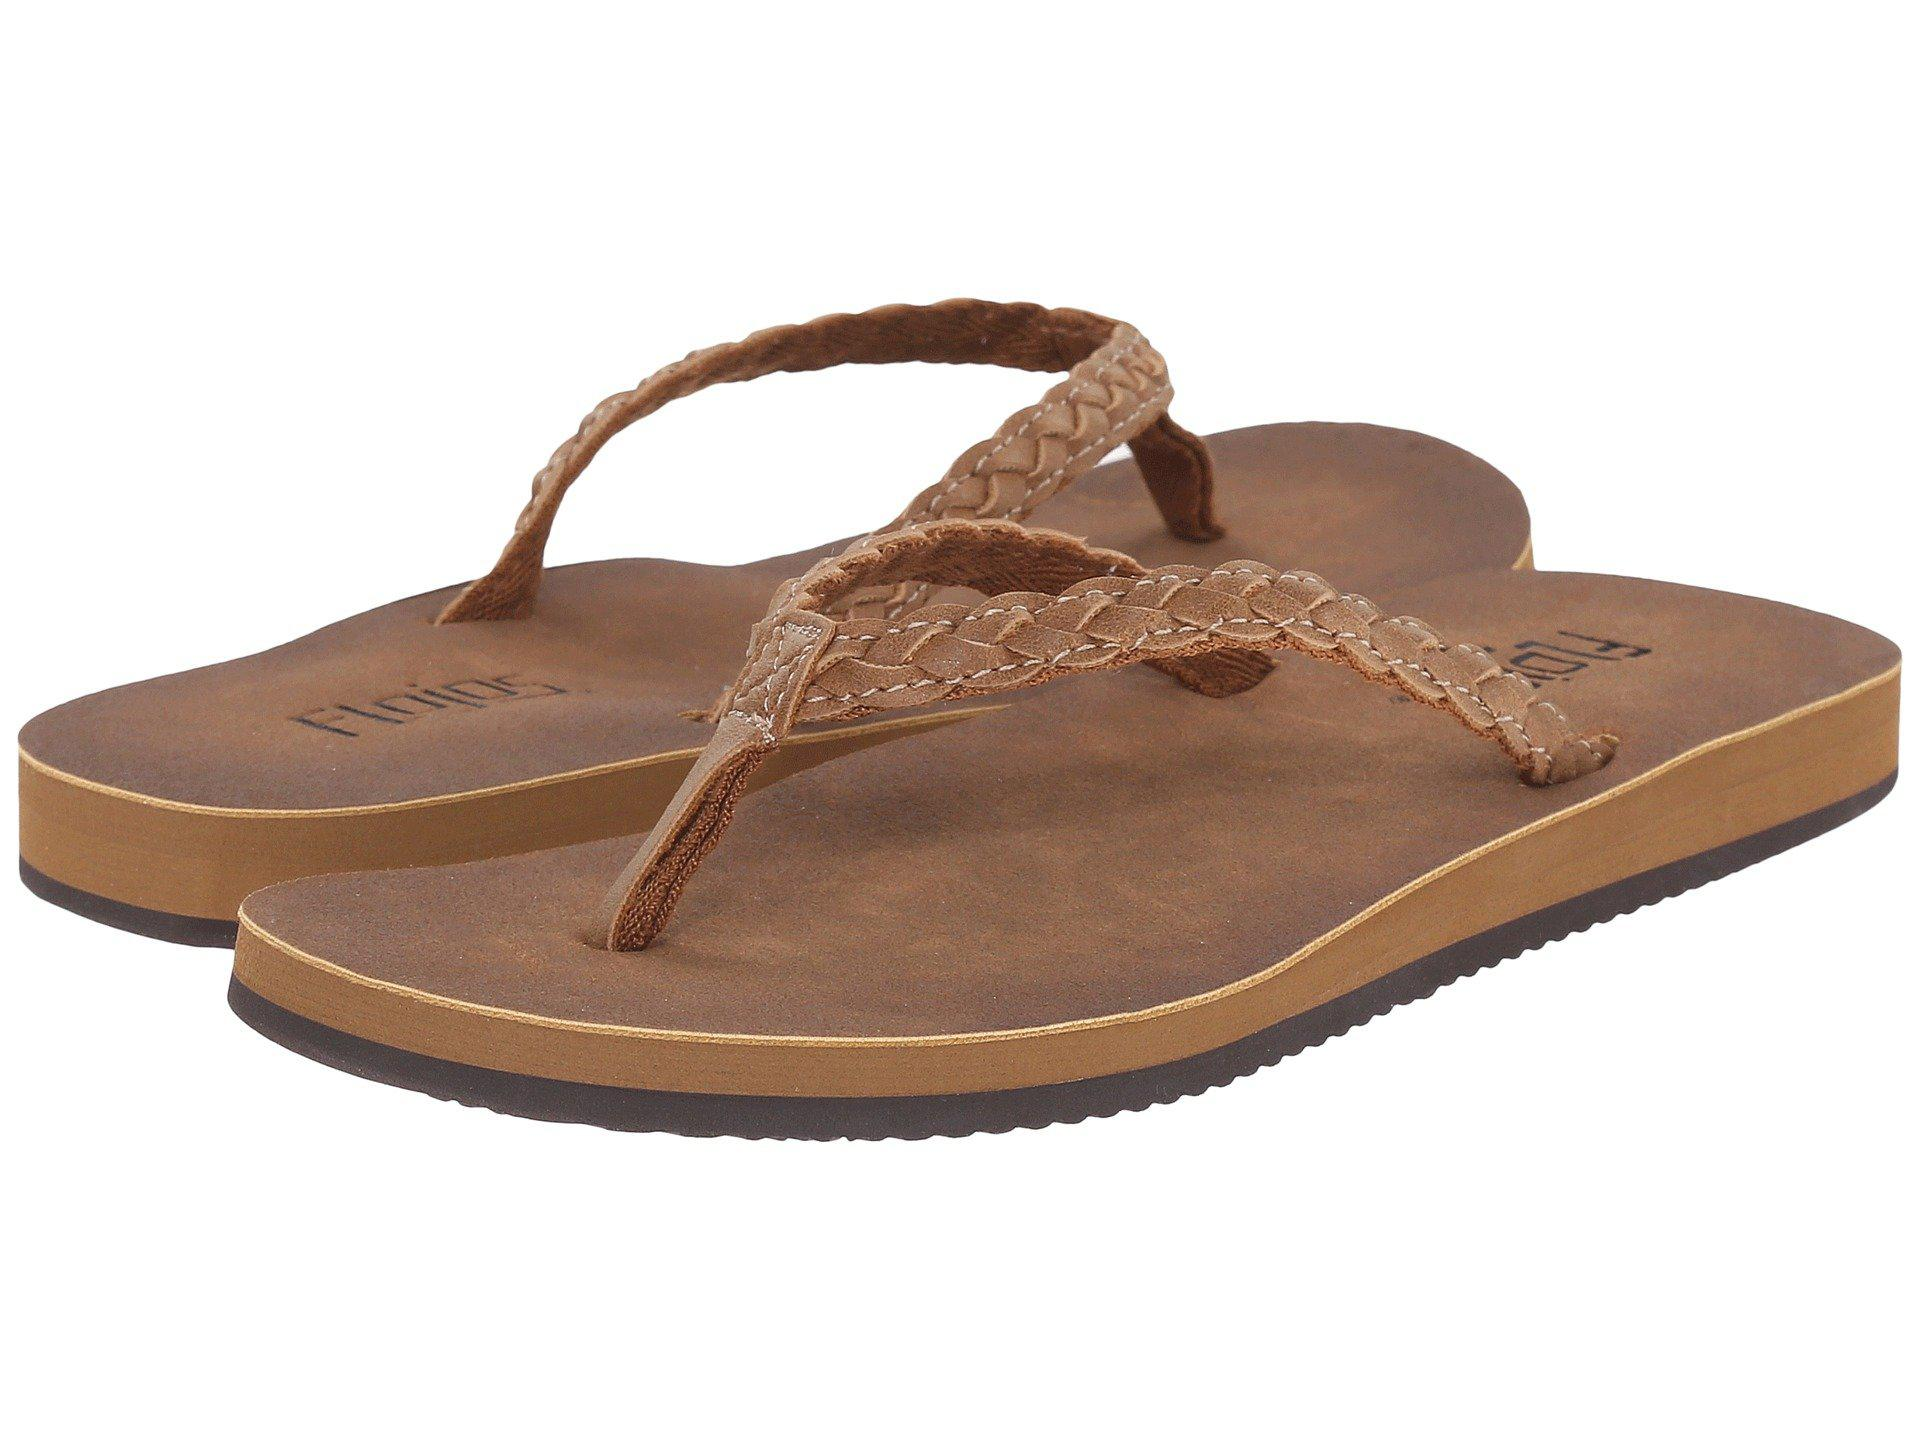 6ec0334a8bdc Lyst - Flojos Sky (tan) Women s Sandals in Brown